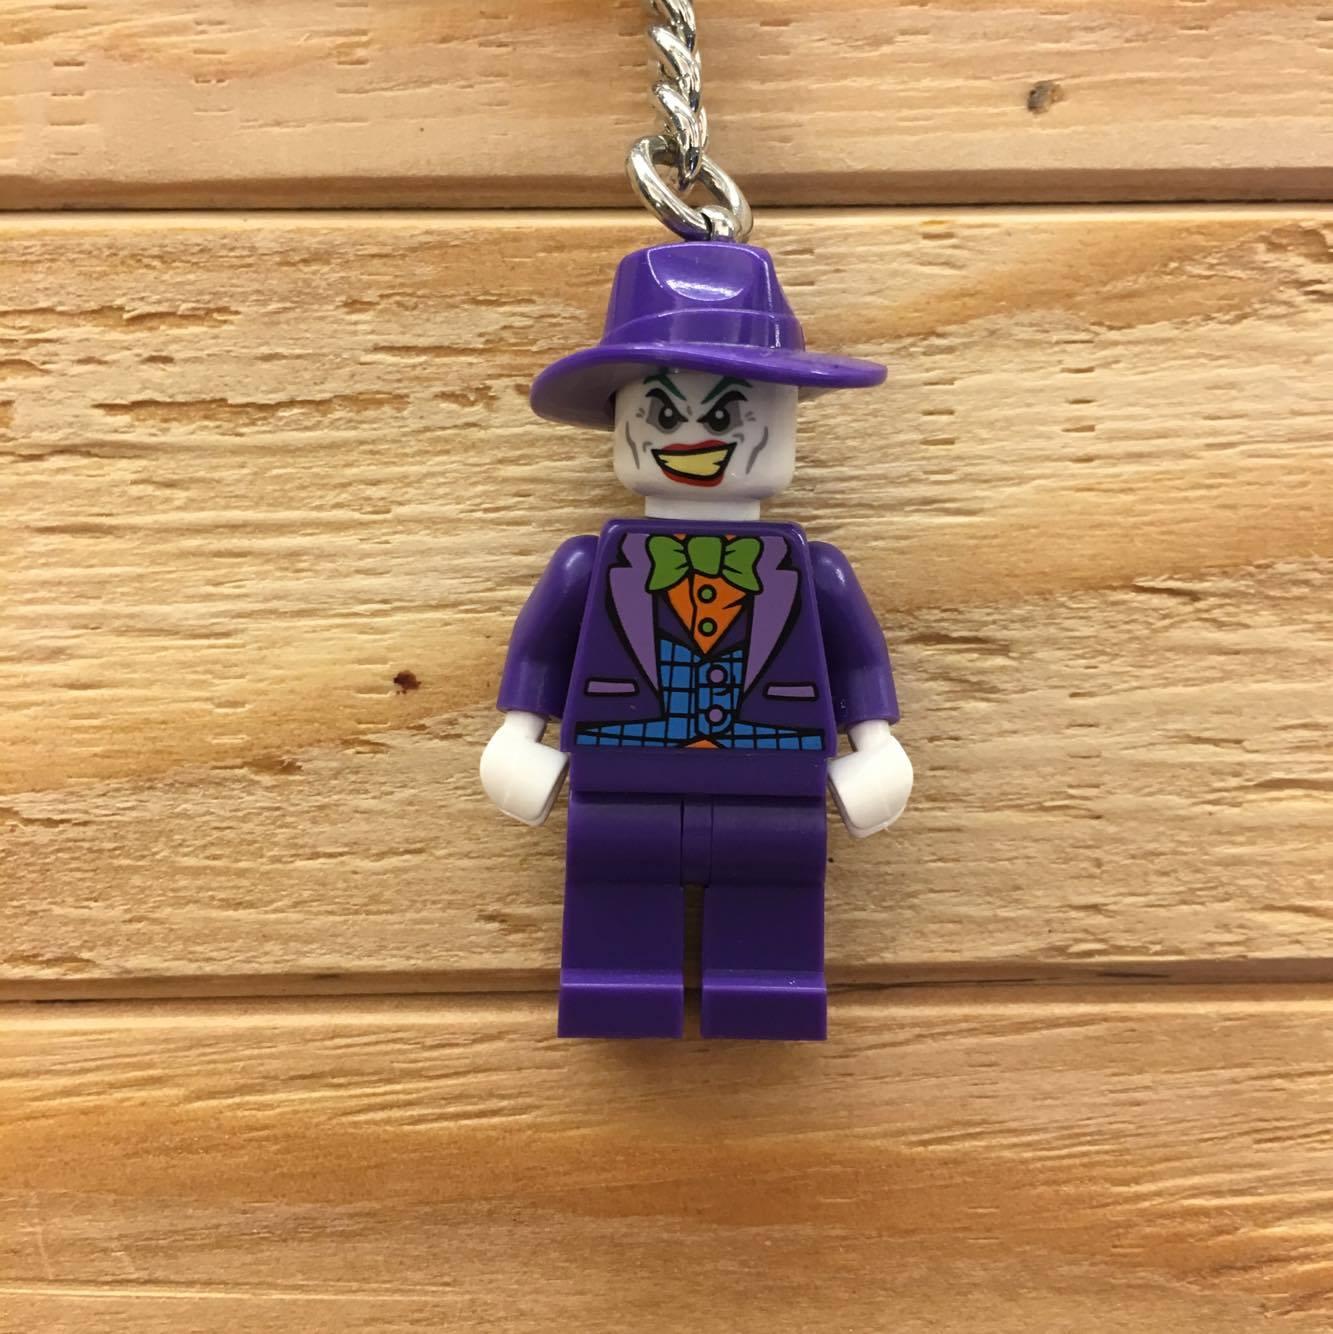 BEETLE LEGO THE JOKER小丑 蝙蝠俠 樂高玩電影 樂高 積木 玩偶 吊飾 鑰匙圈 玩具 正品 聖誕禮物